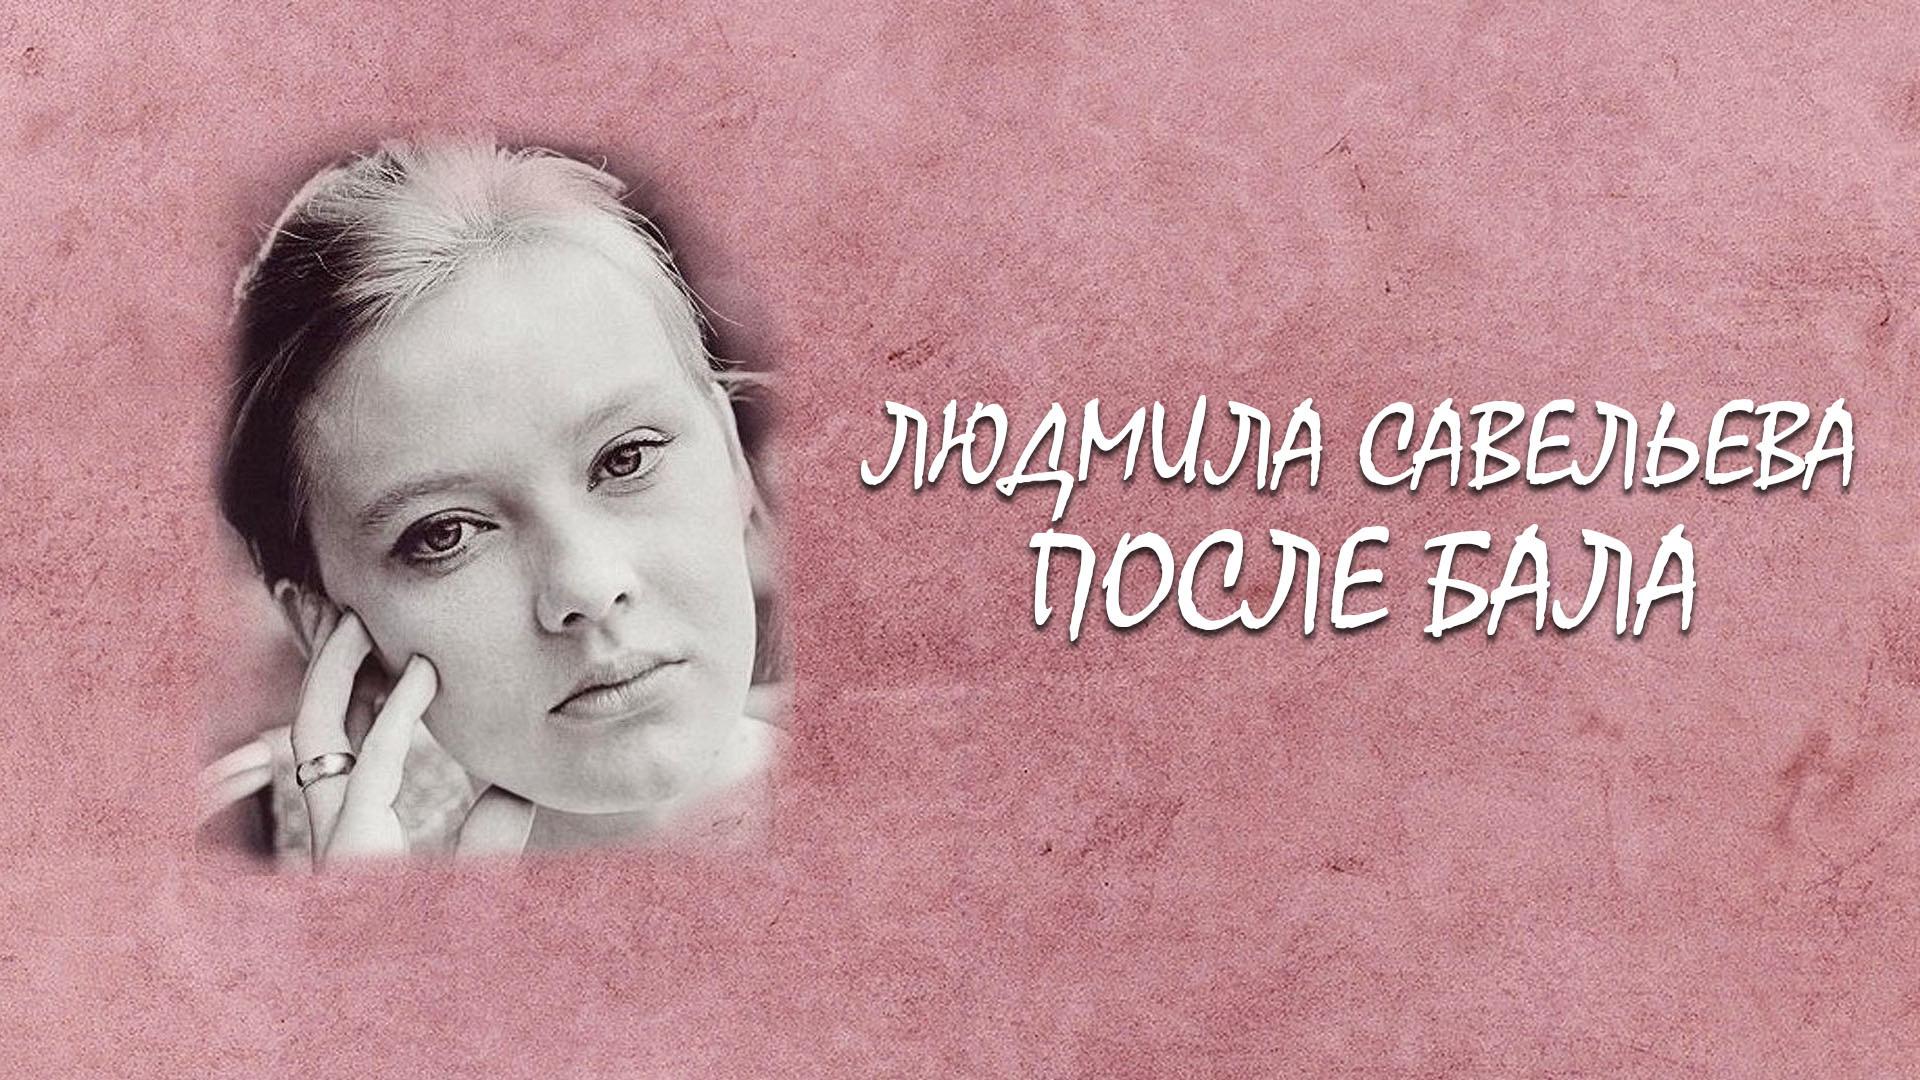 Людмила Савельева. После бала